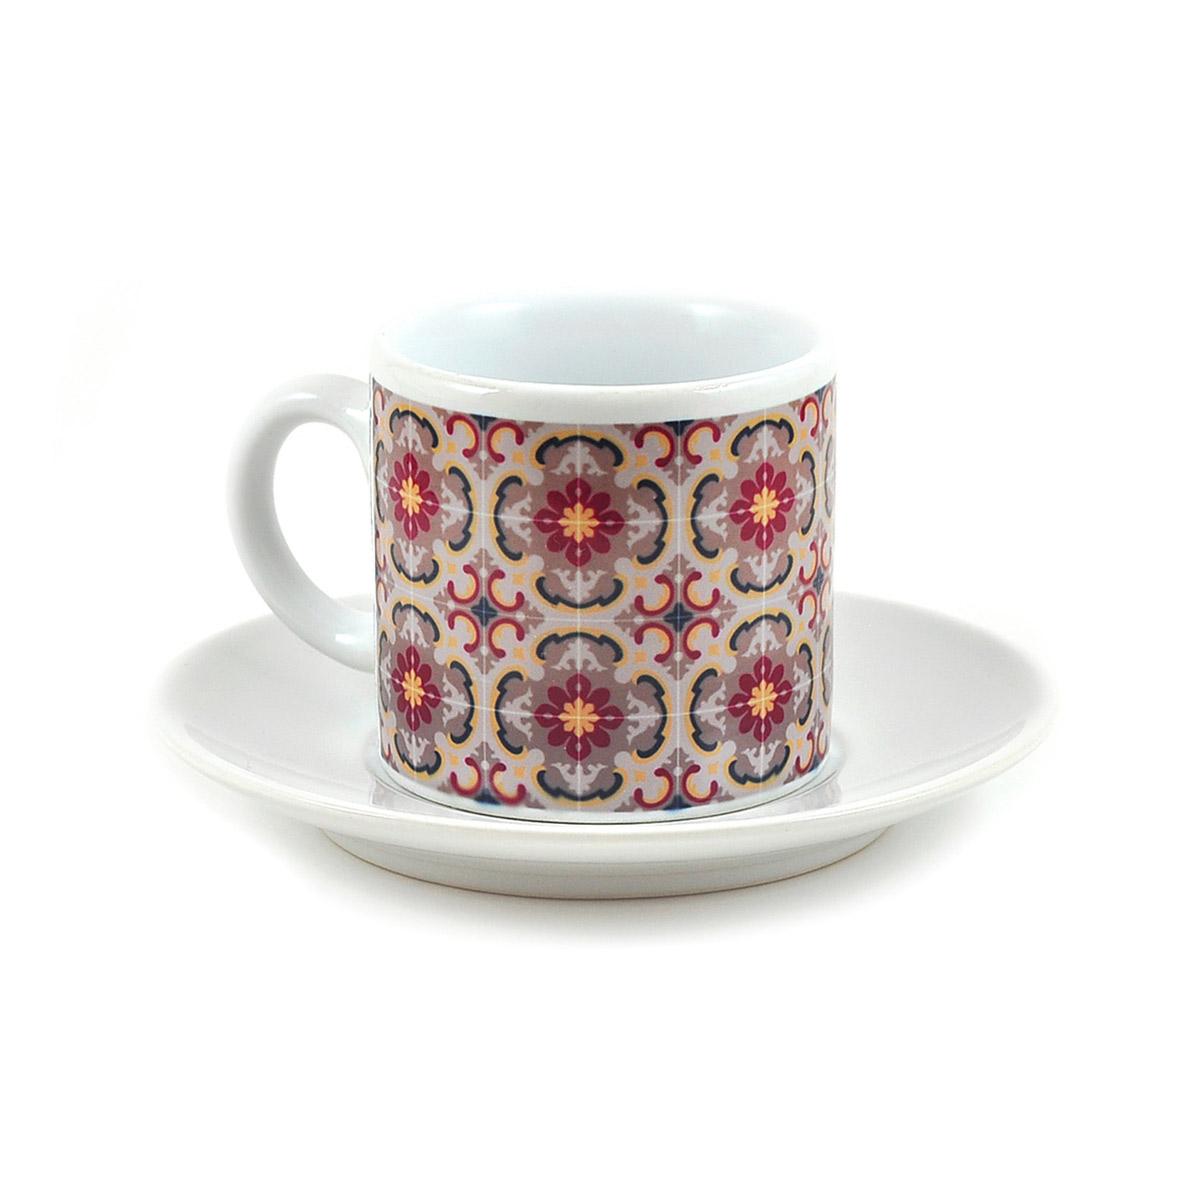 Malta Tile Espresso Cup & Saucer, pattern no.11